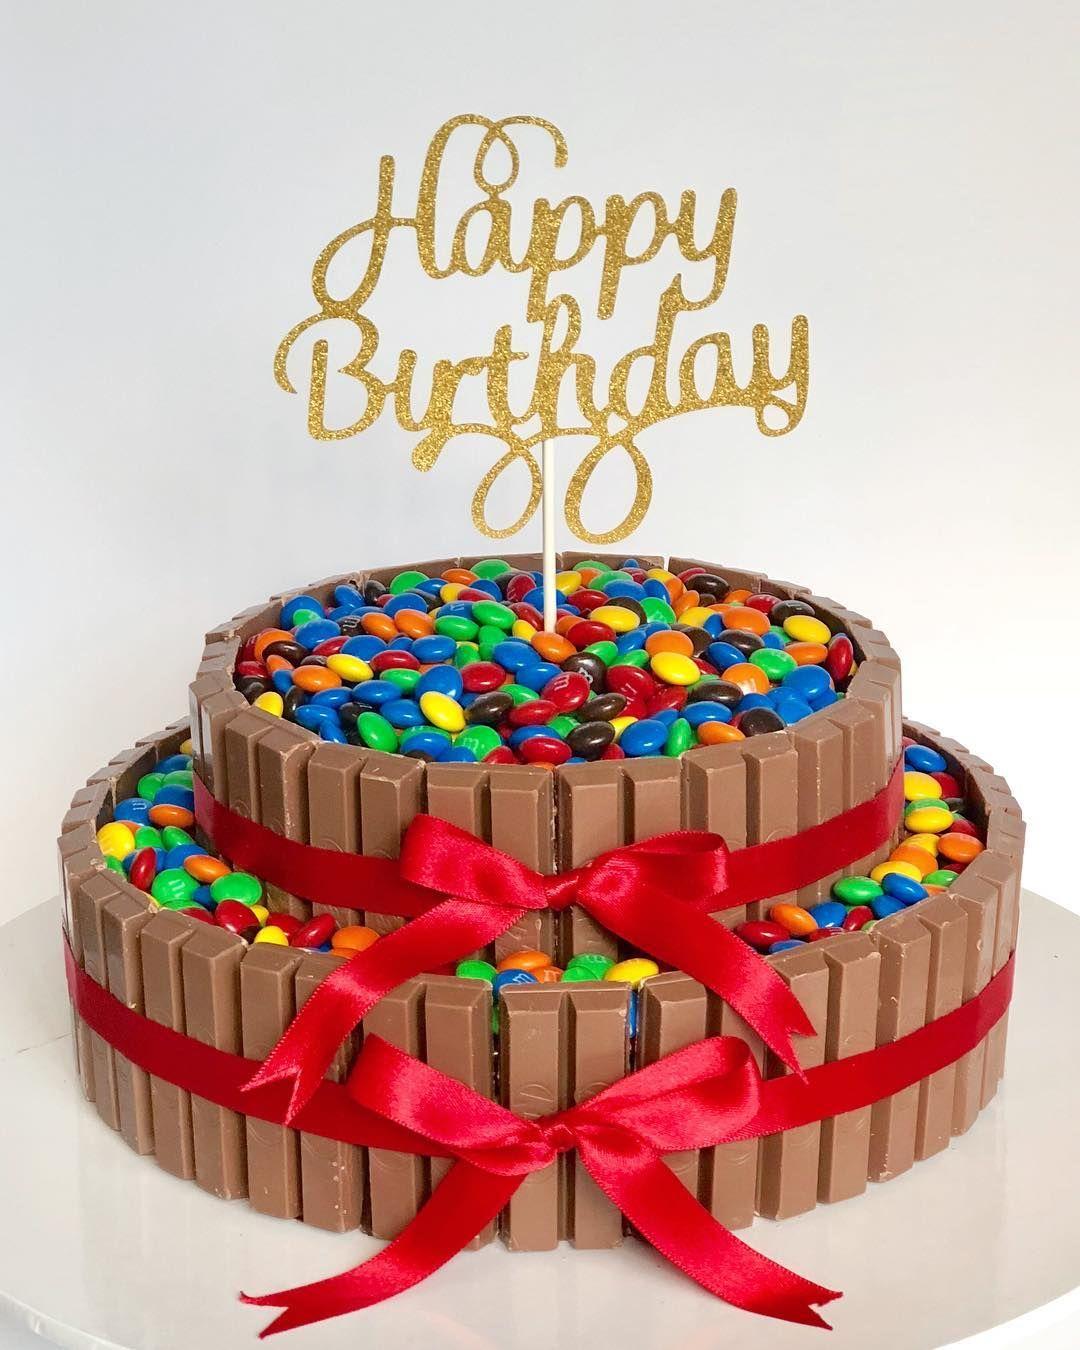 Kit Kat Cake Bolos De Aniversario Bolo Aniversario